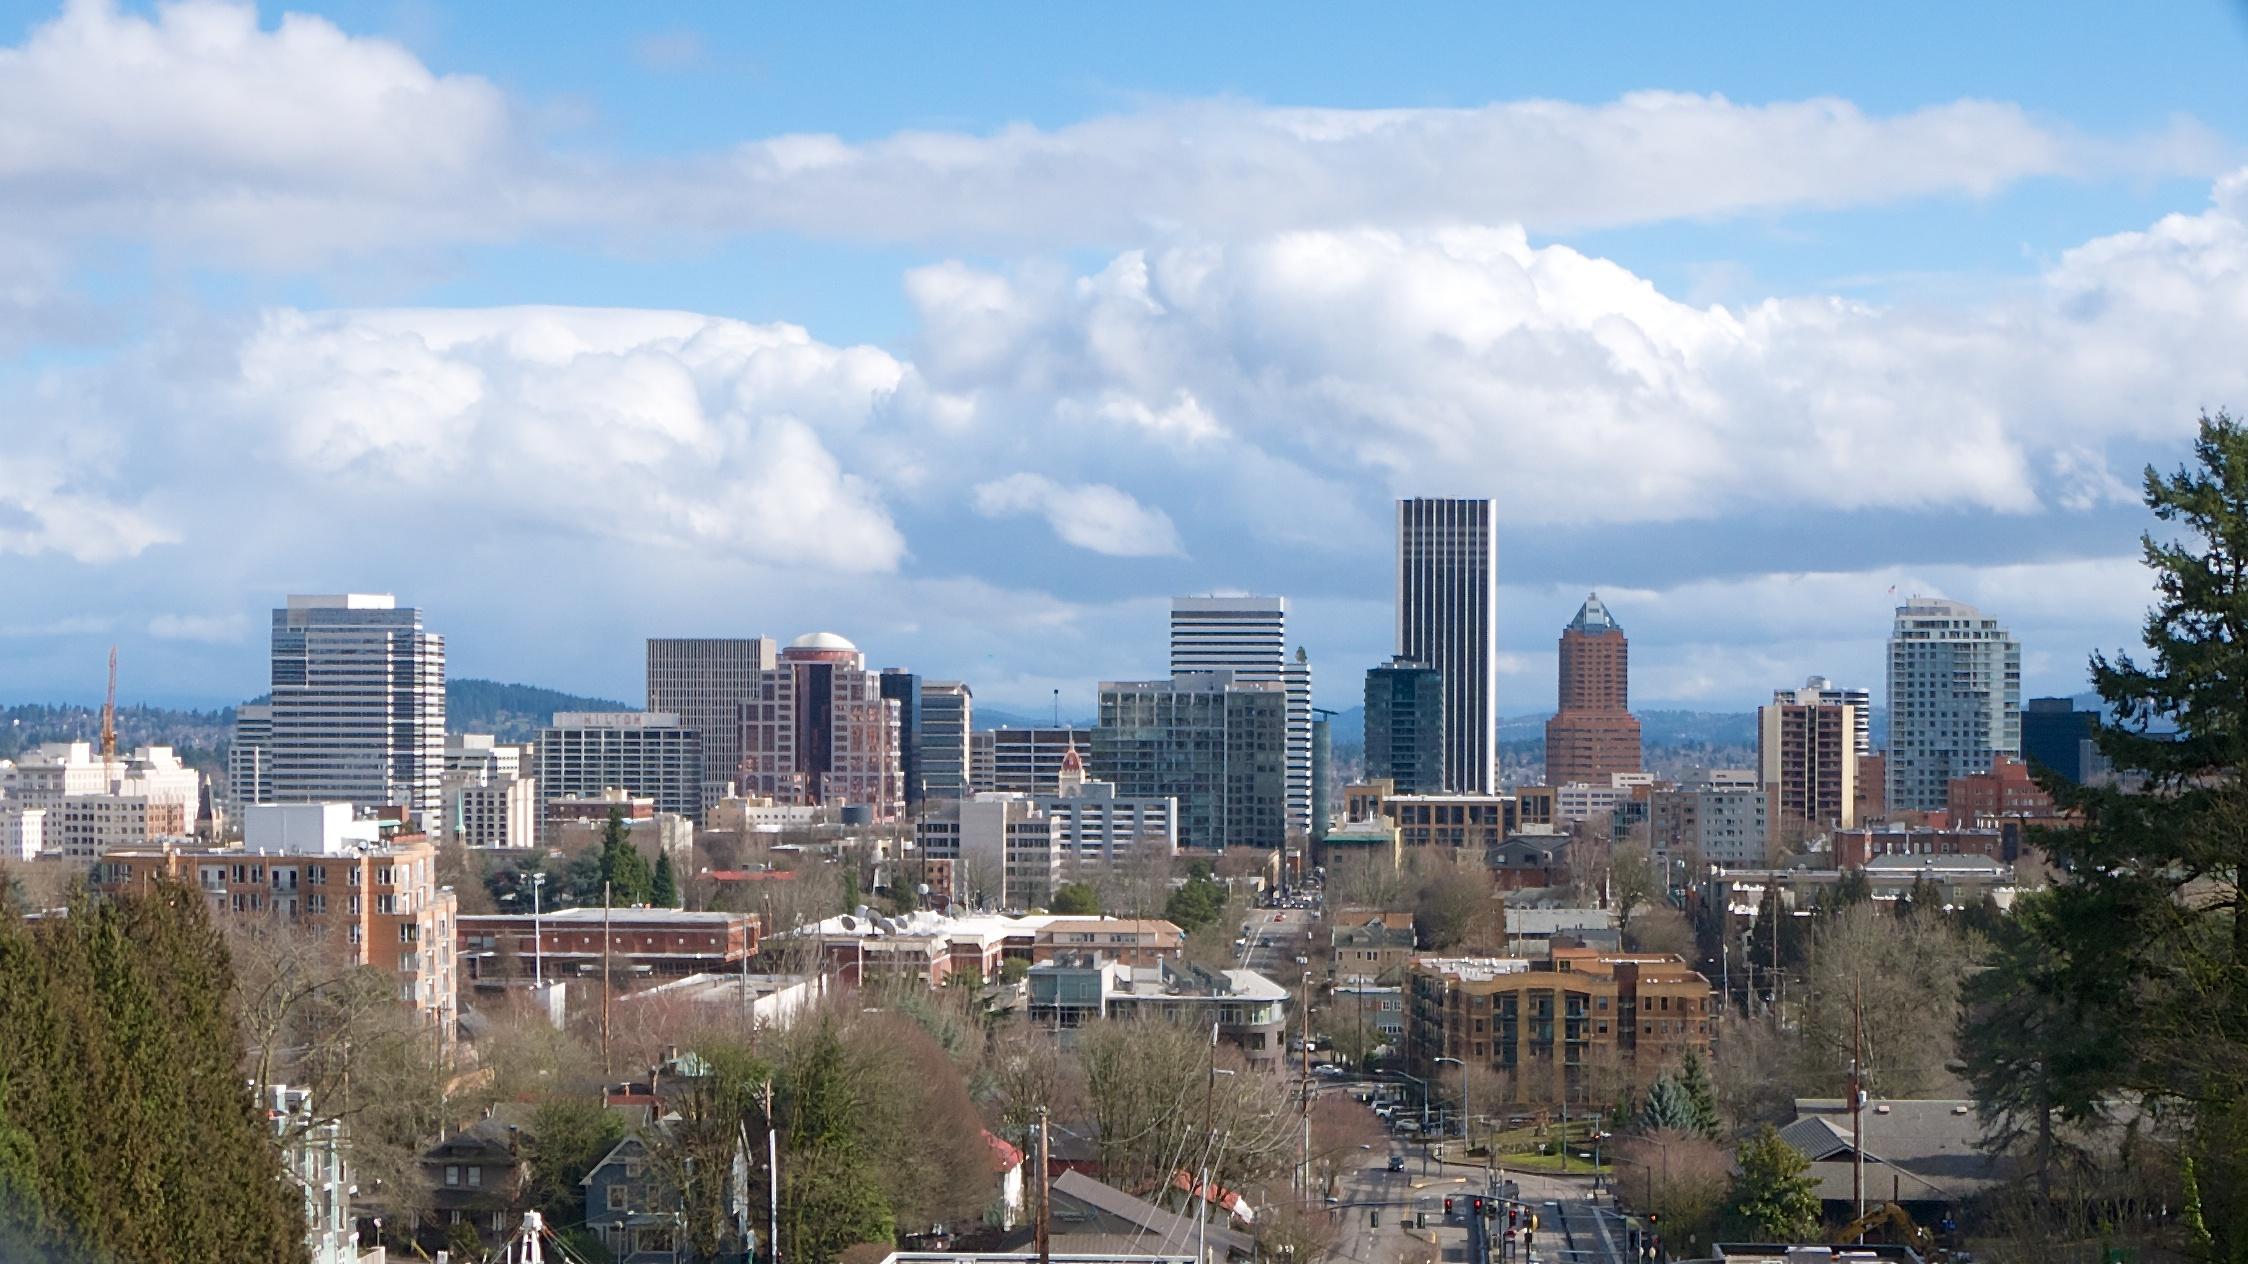 View from Vista Bridge